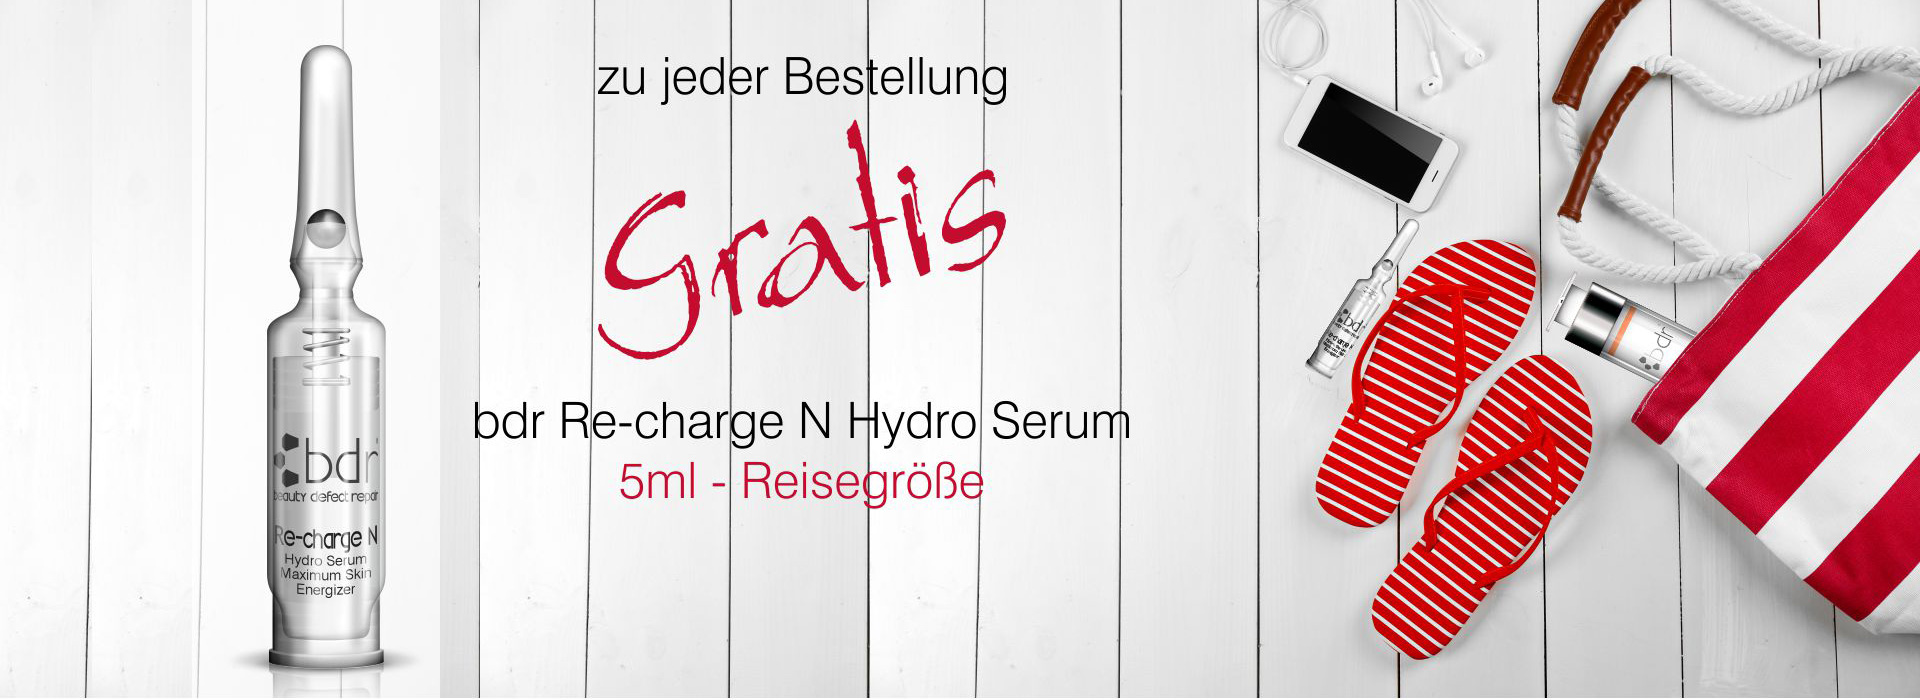 GRATIS bdr Re-charge N Hydro Serum